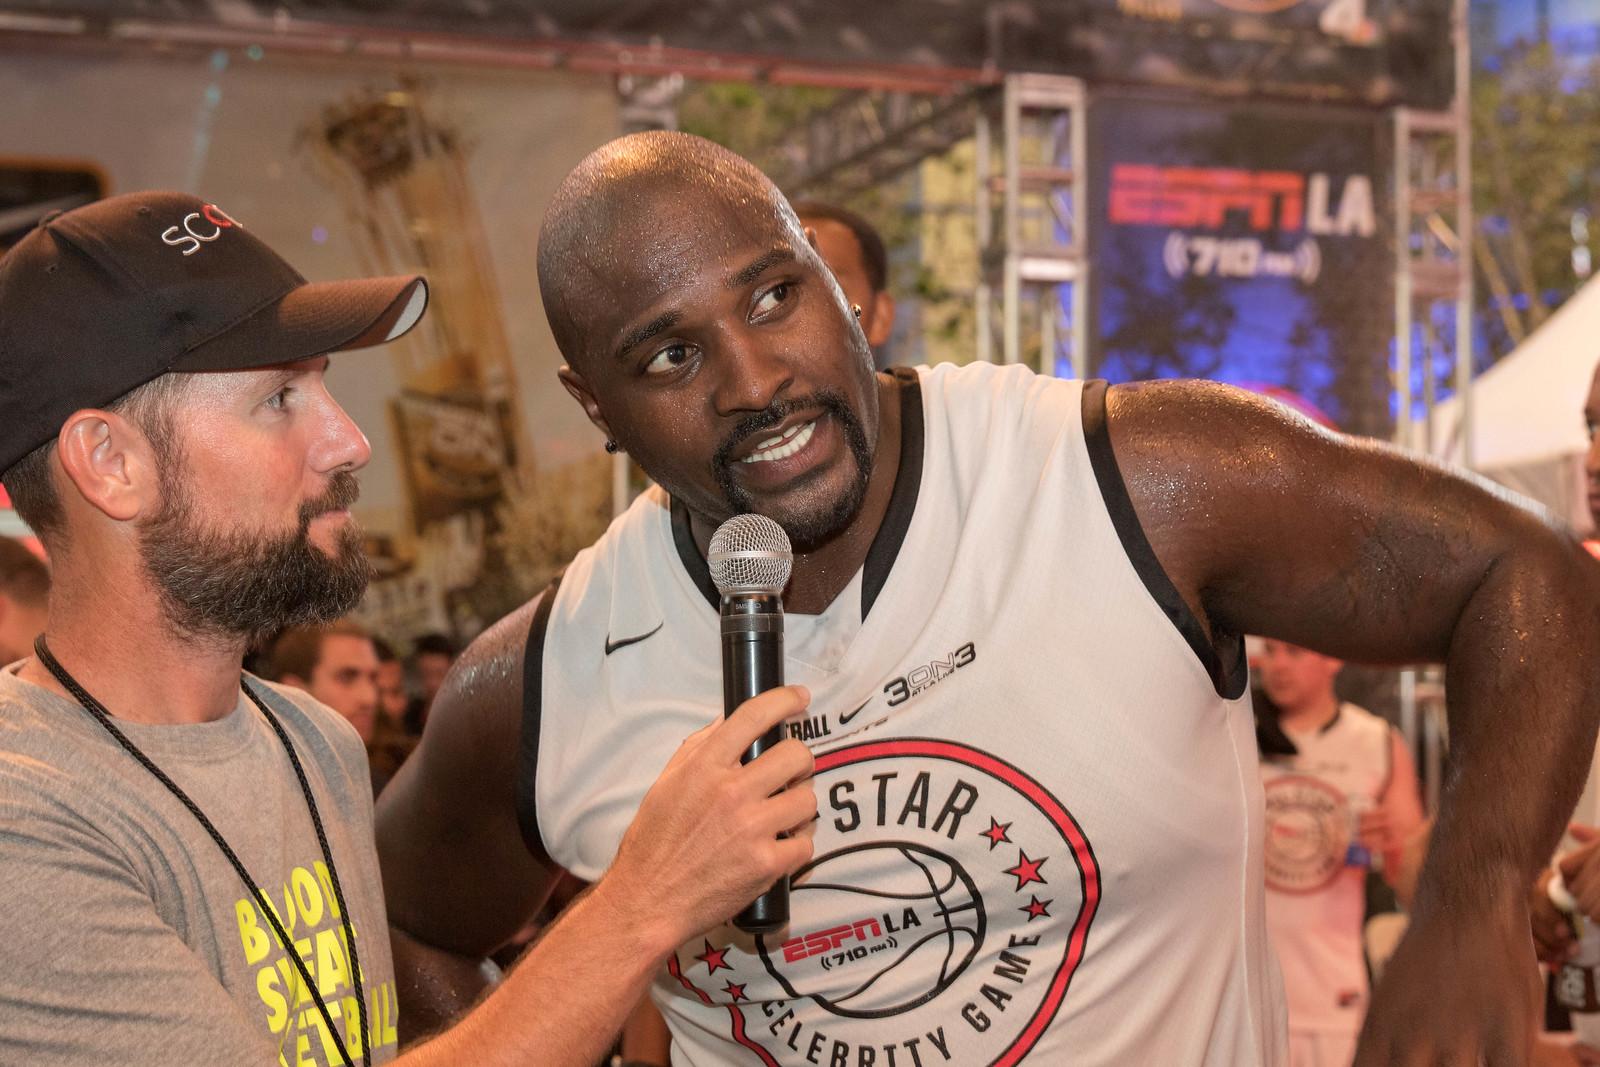 Nike 3on3_2015_ESPN710 All-Star Celebrity Game 5 Scotty B Marcellus Wiley.jpg